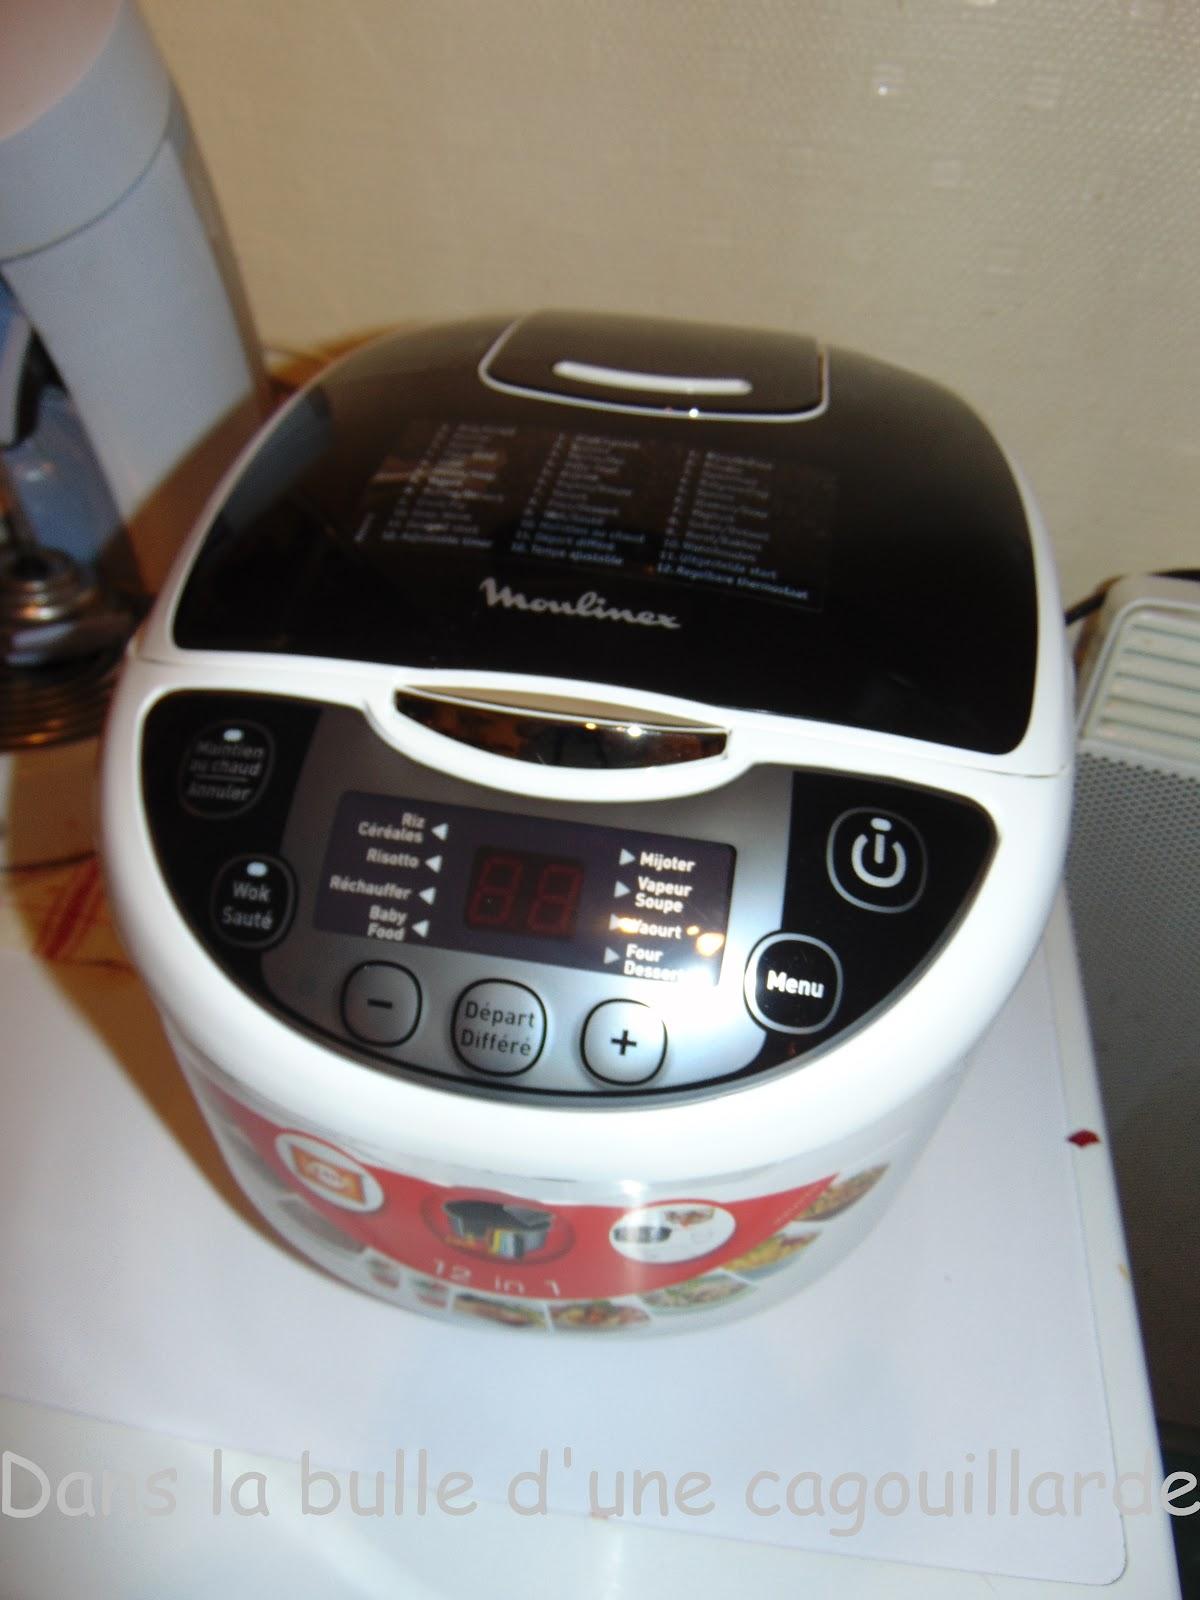 Dans la bulle d 39 une cagouillarde la cagouillarde cuisine avec un multicu - Multicuiseur philips ou moulinex ...